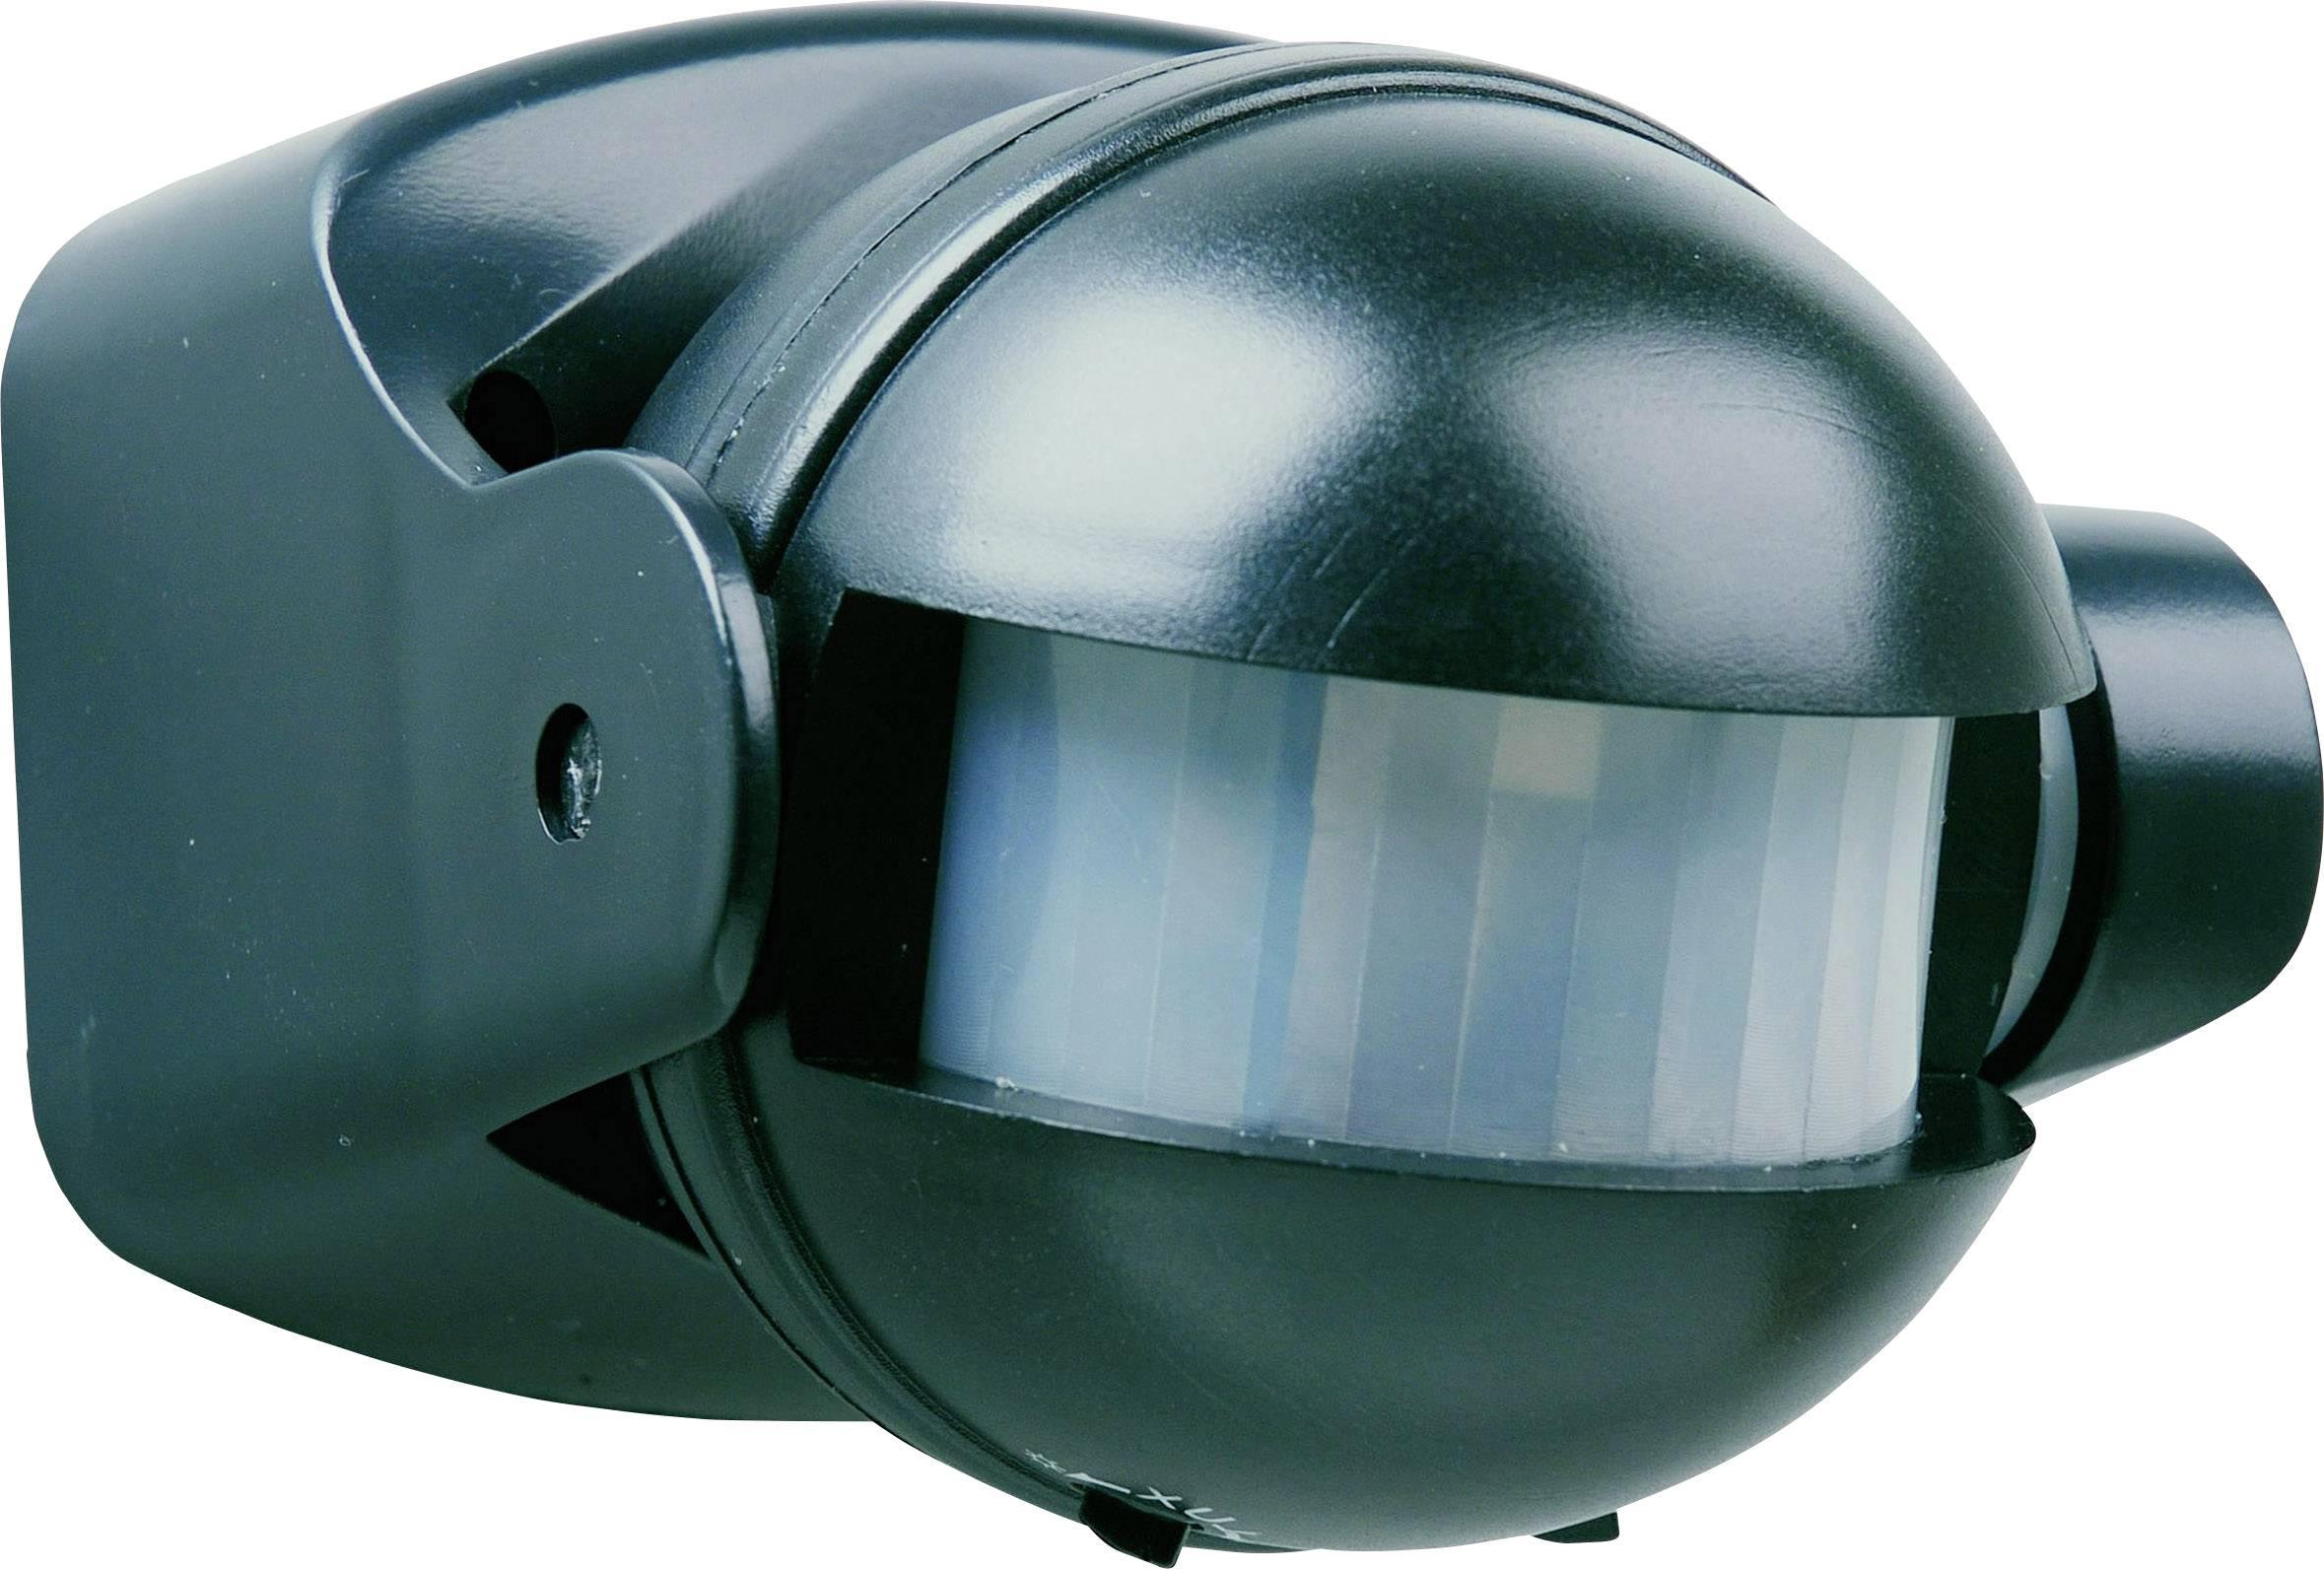 Detektor pohybu PIR Smartwares 10.017.11, 180 °, černá, IP44